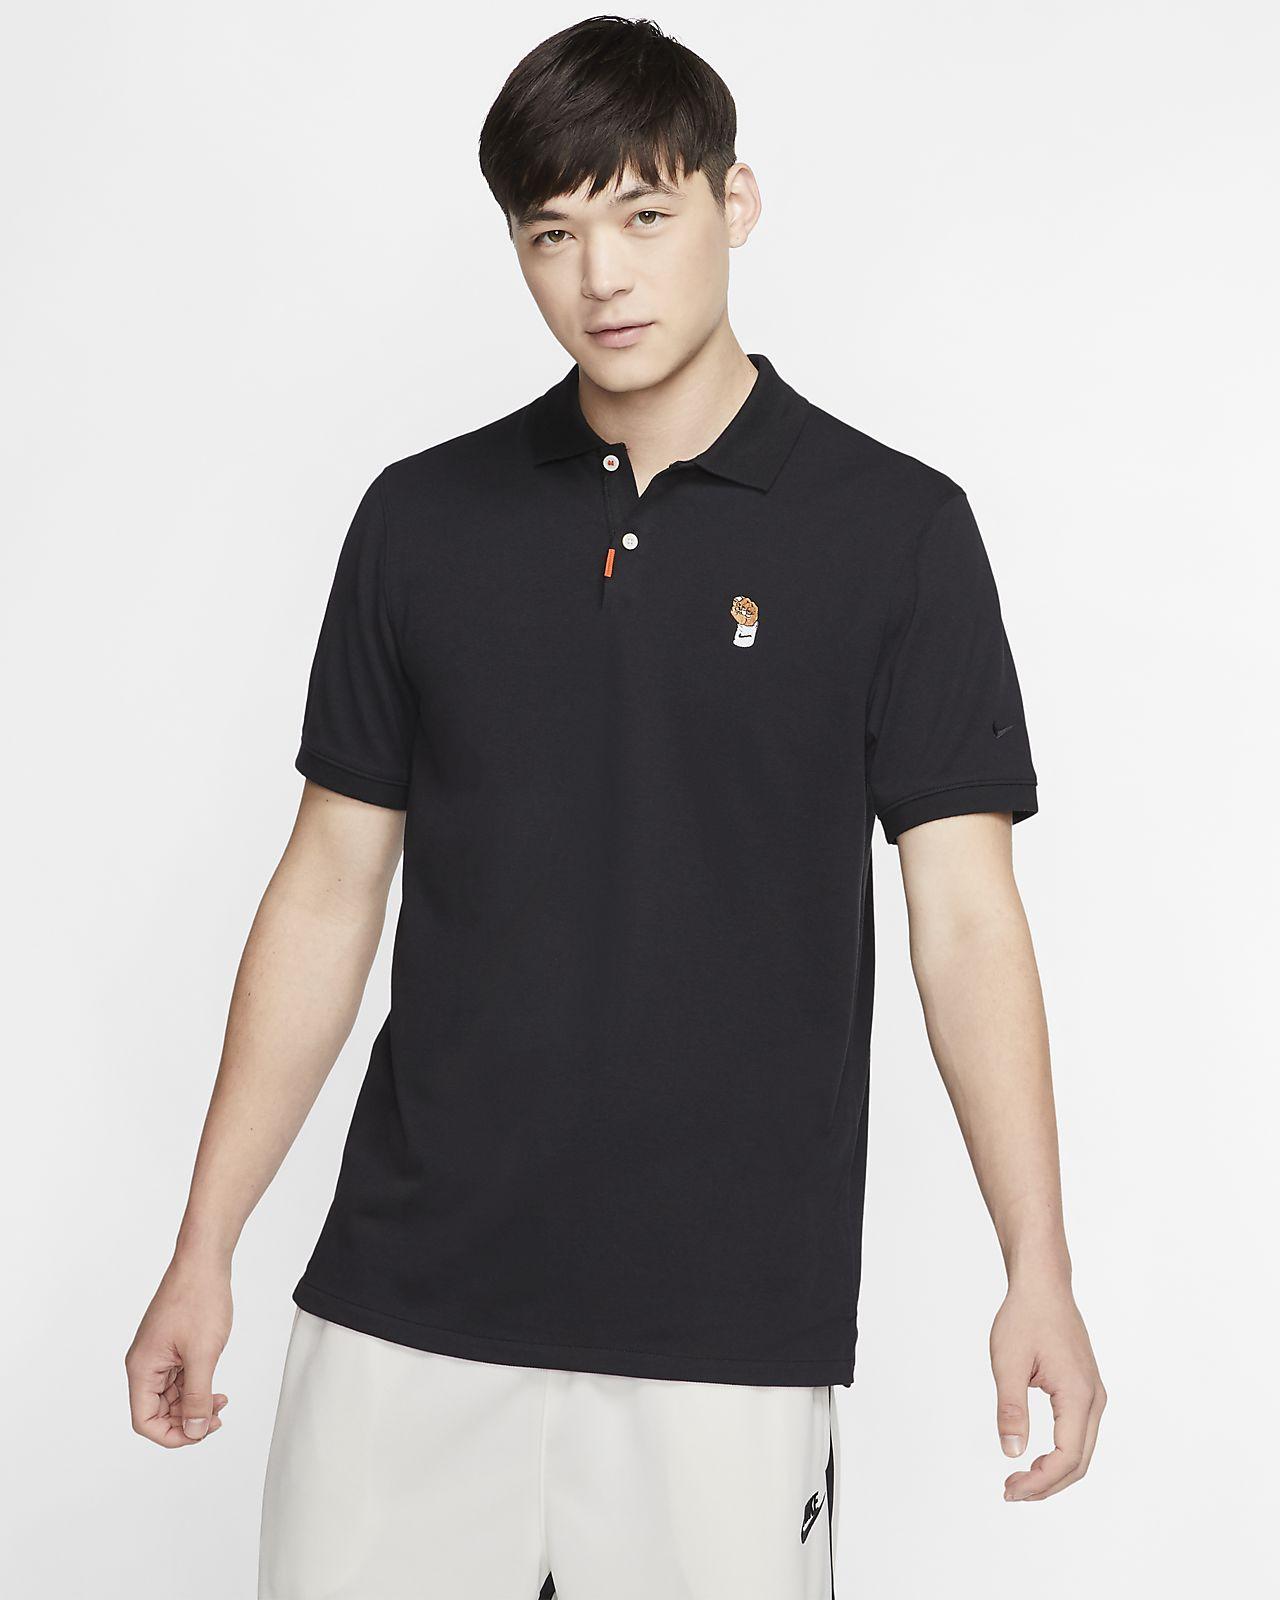 The Nike Polo ¡Vamos Rafa! Unisex μπλούζα πόλο με στενή εφαρμογή